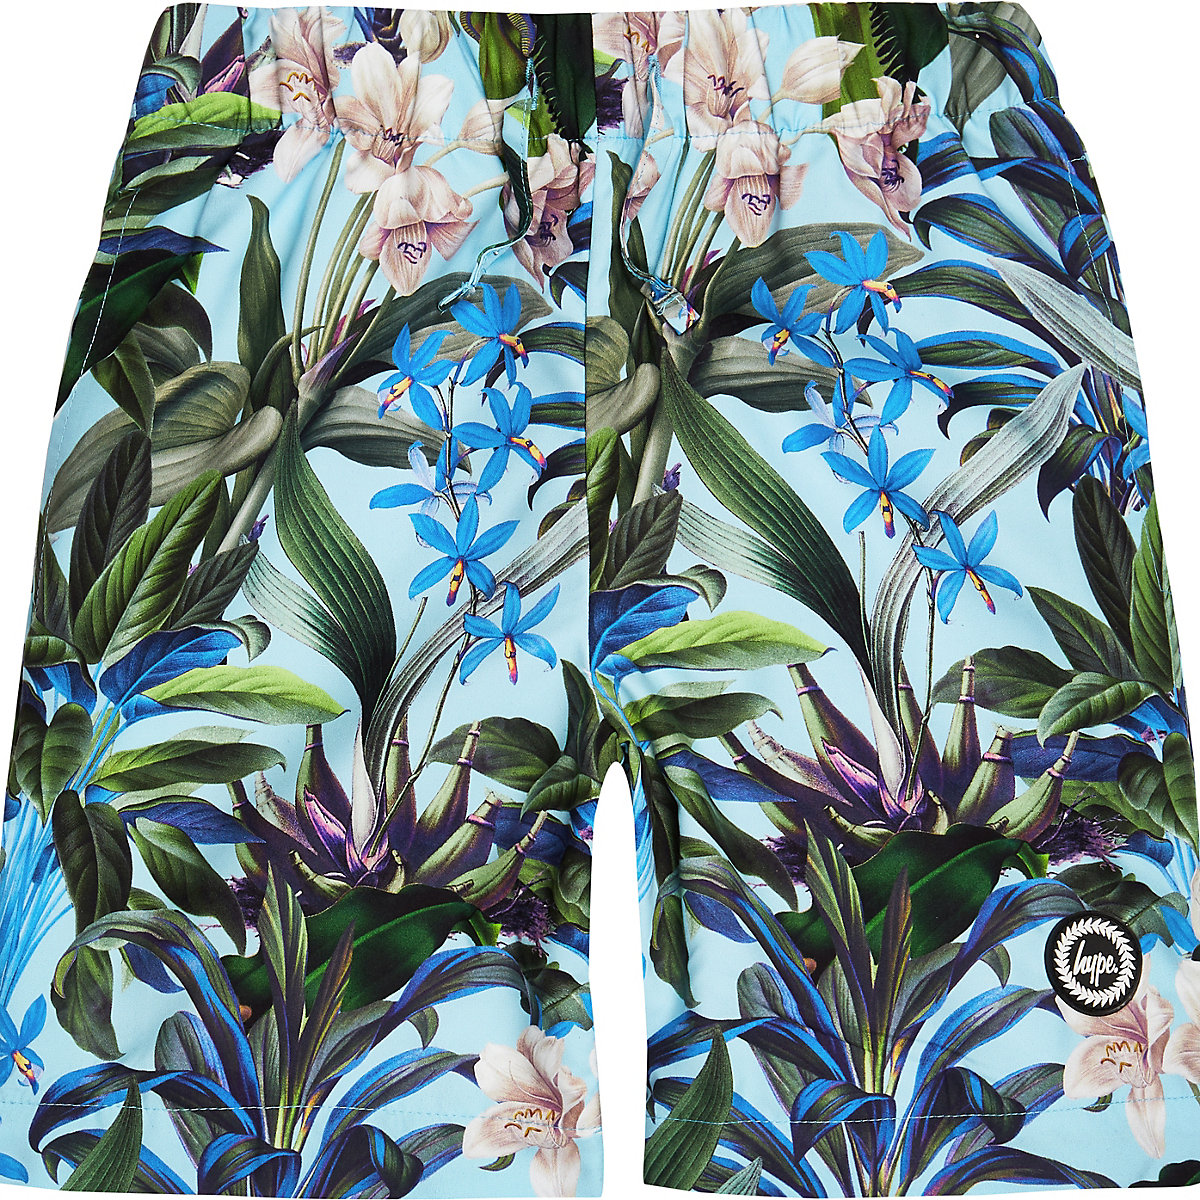 Boys Hype blue tropical swim shorts